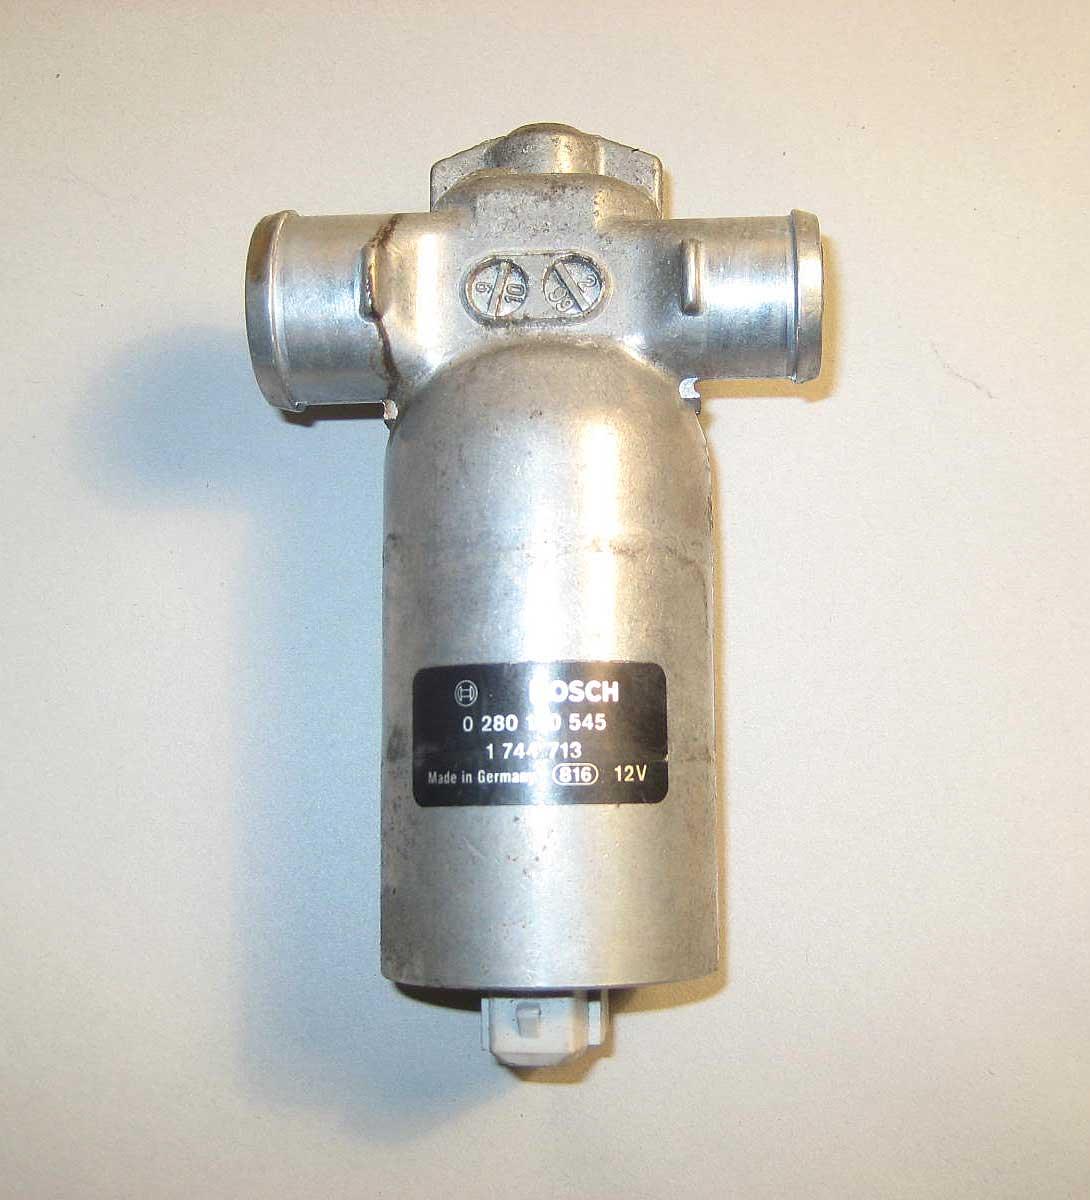 hight resolution of bmw t idle control valve icv iac bosch 1993 2006 oem used e36 e39 e46 m50 m52